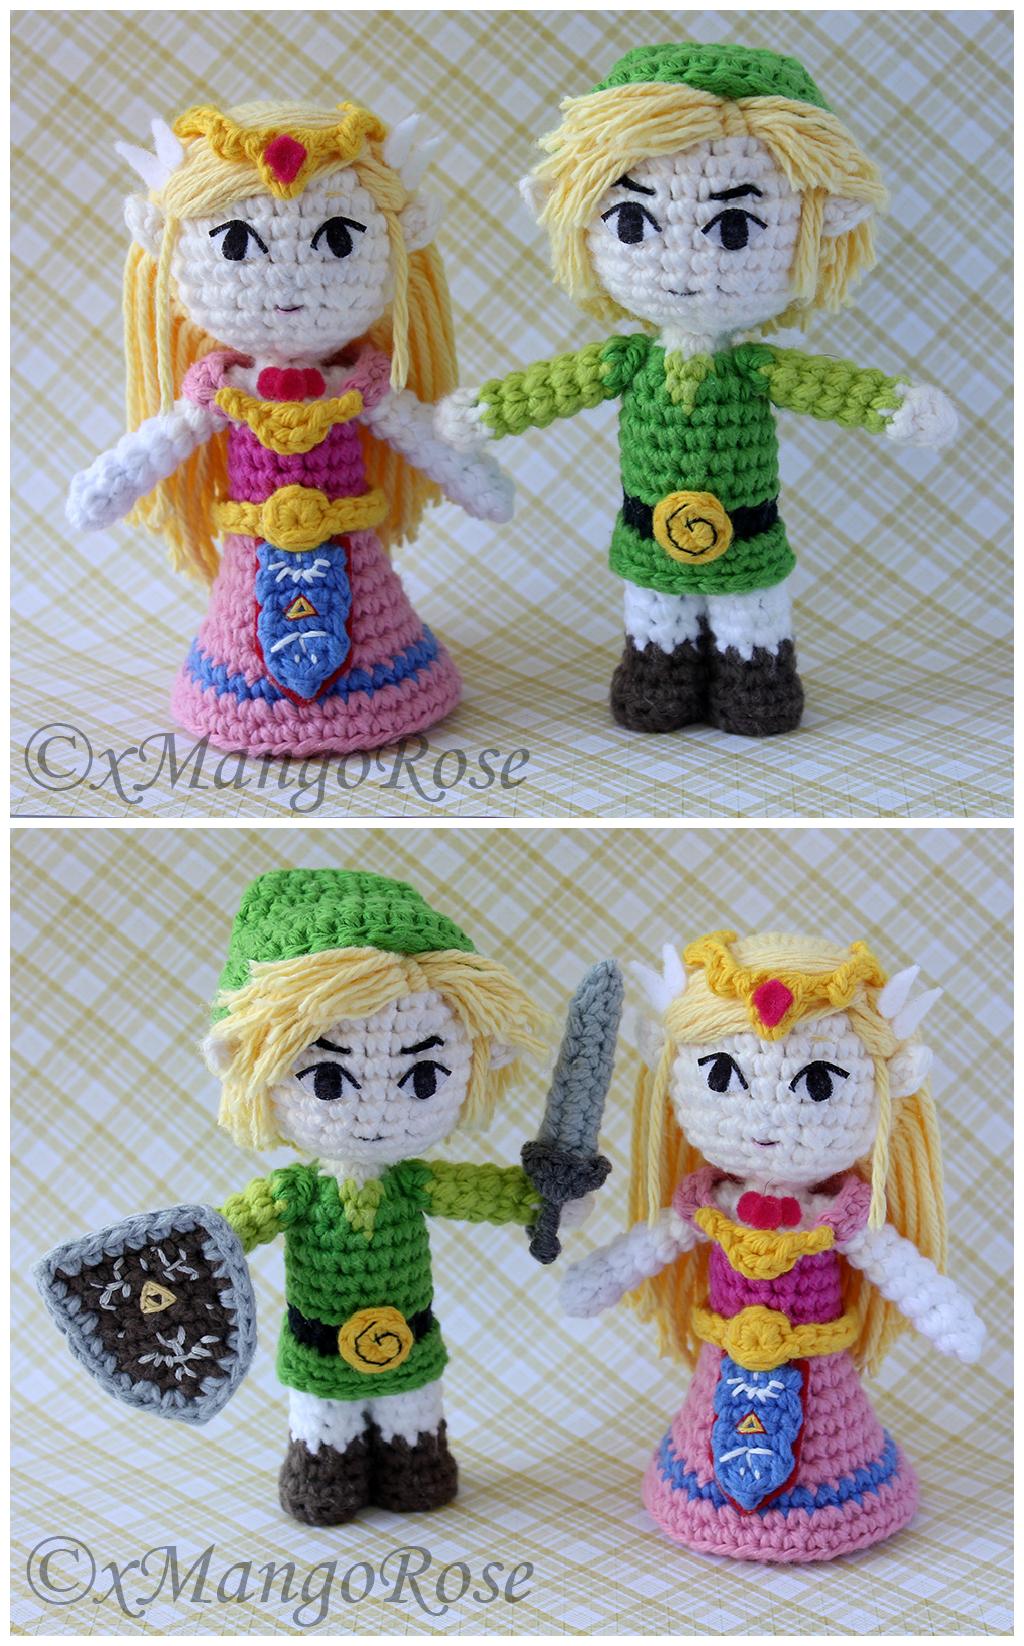 Amigurumi Mouse Pattern : Toon Link and Zelda Amigurumi Doll Plush by xMangoRose on ...